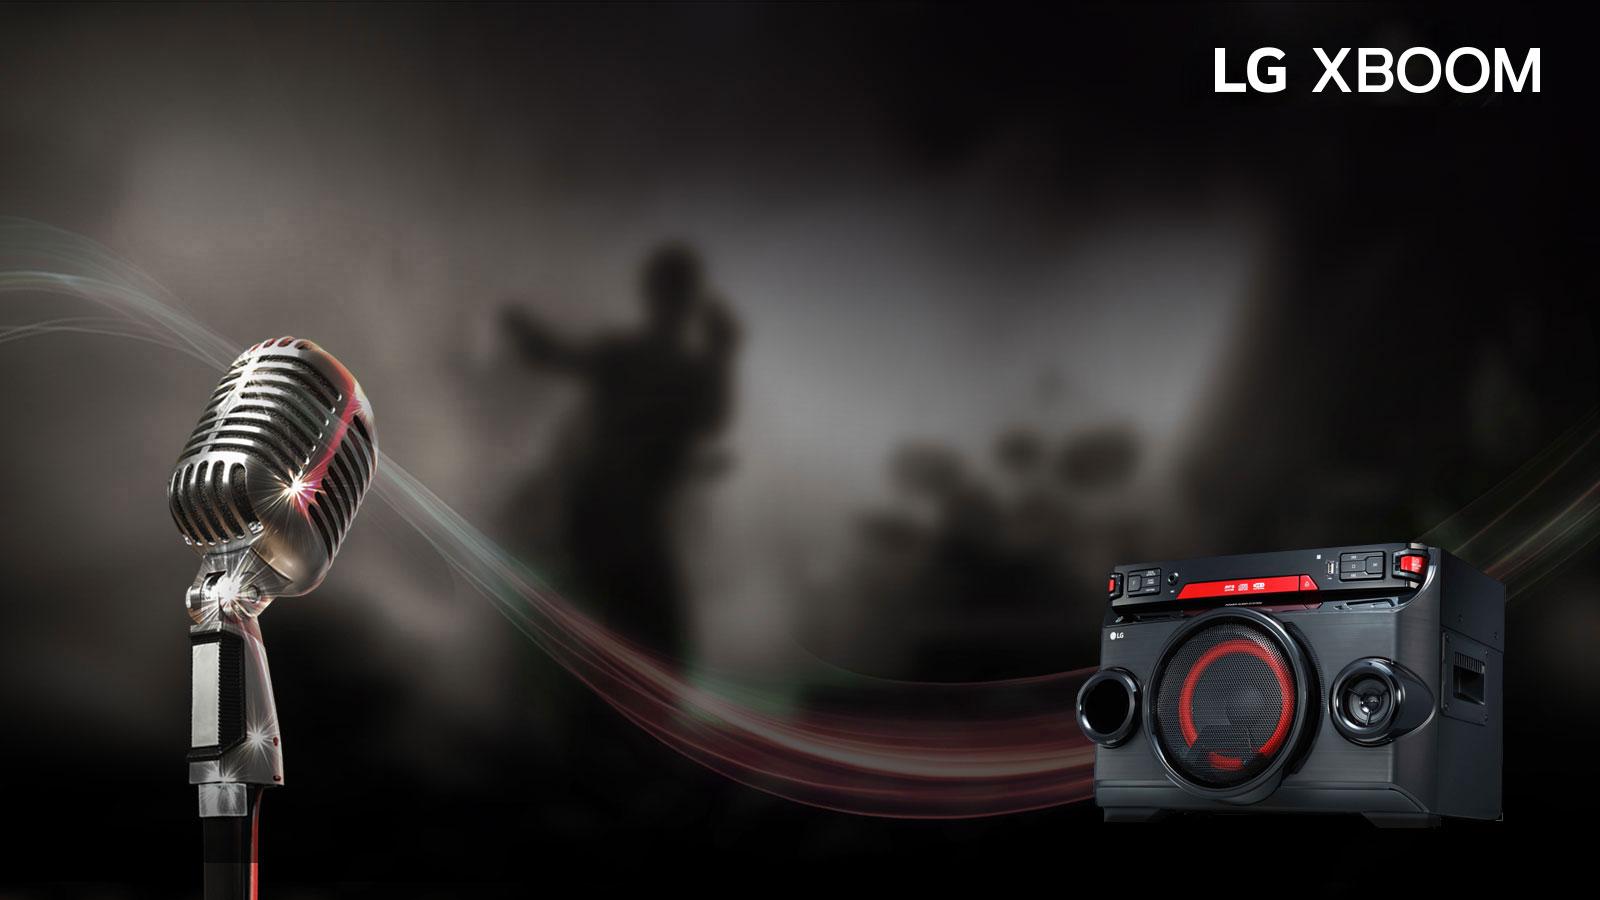 LG XBOOM OK45 All In One Mini System, Auto DJ   LG IN